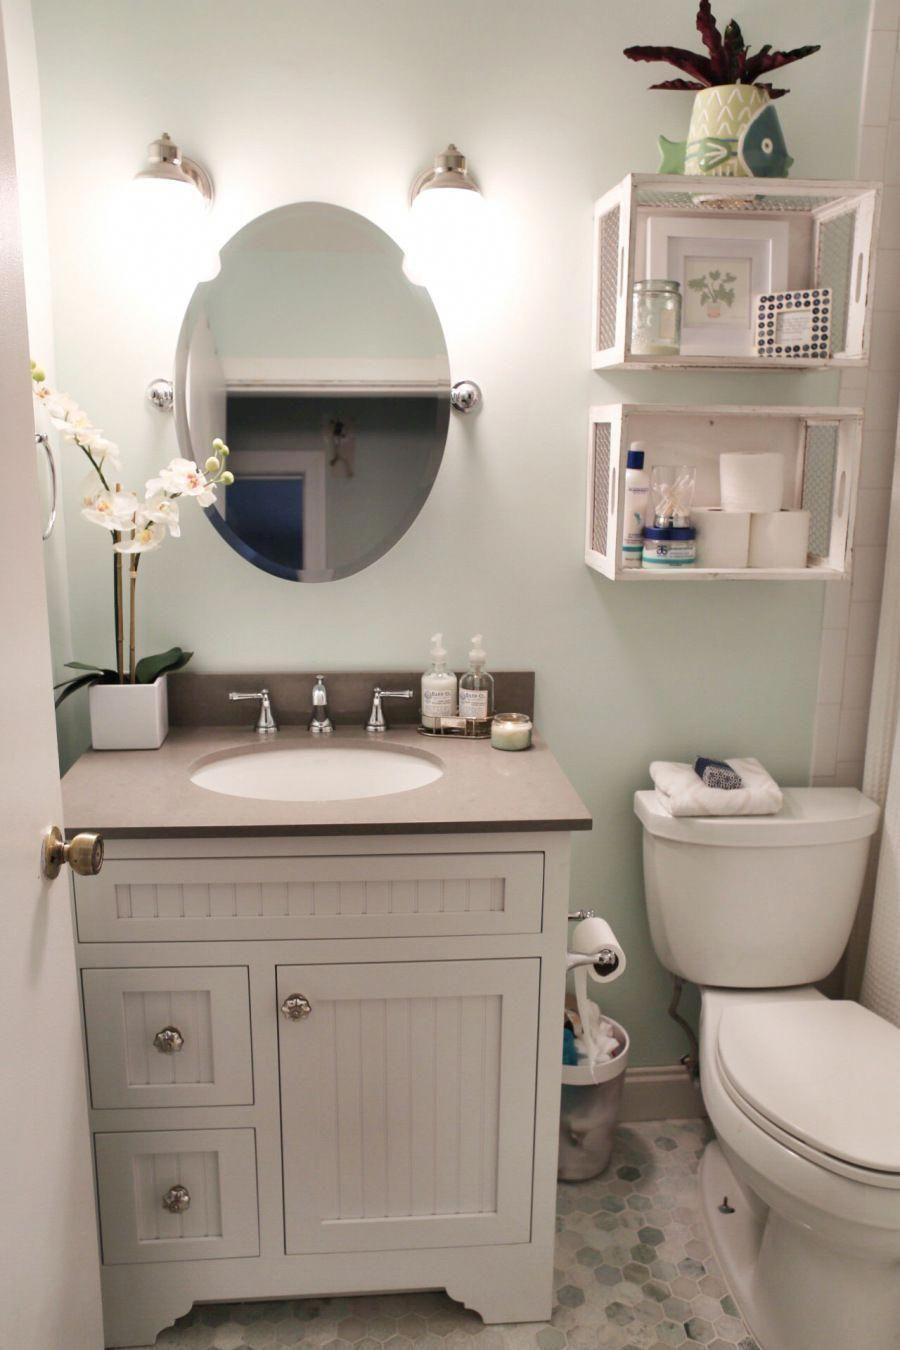 Peach Bathroom Decor, Peach And Gray Bathroom Accessories